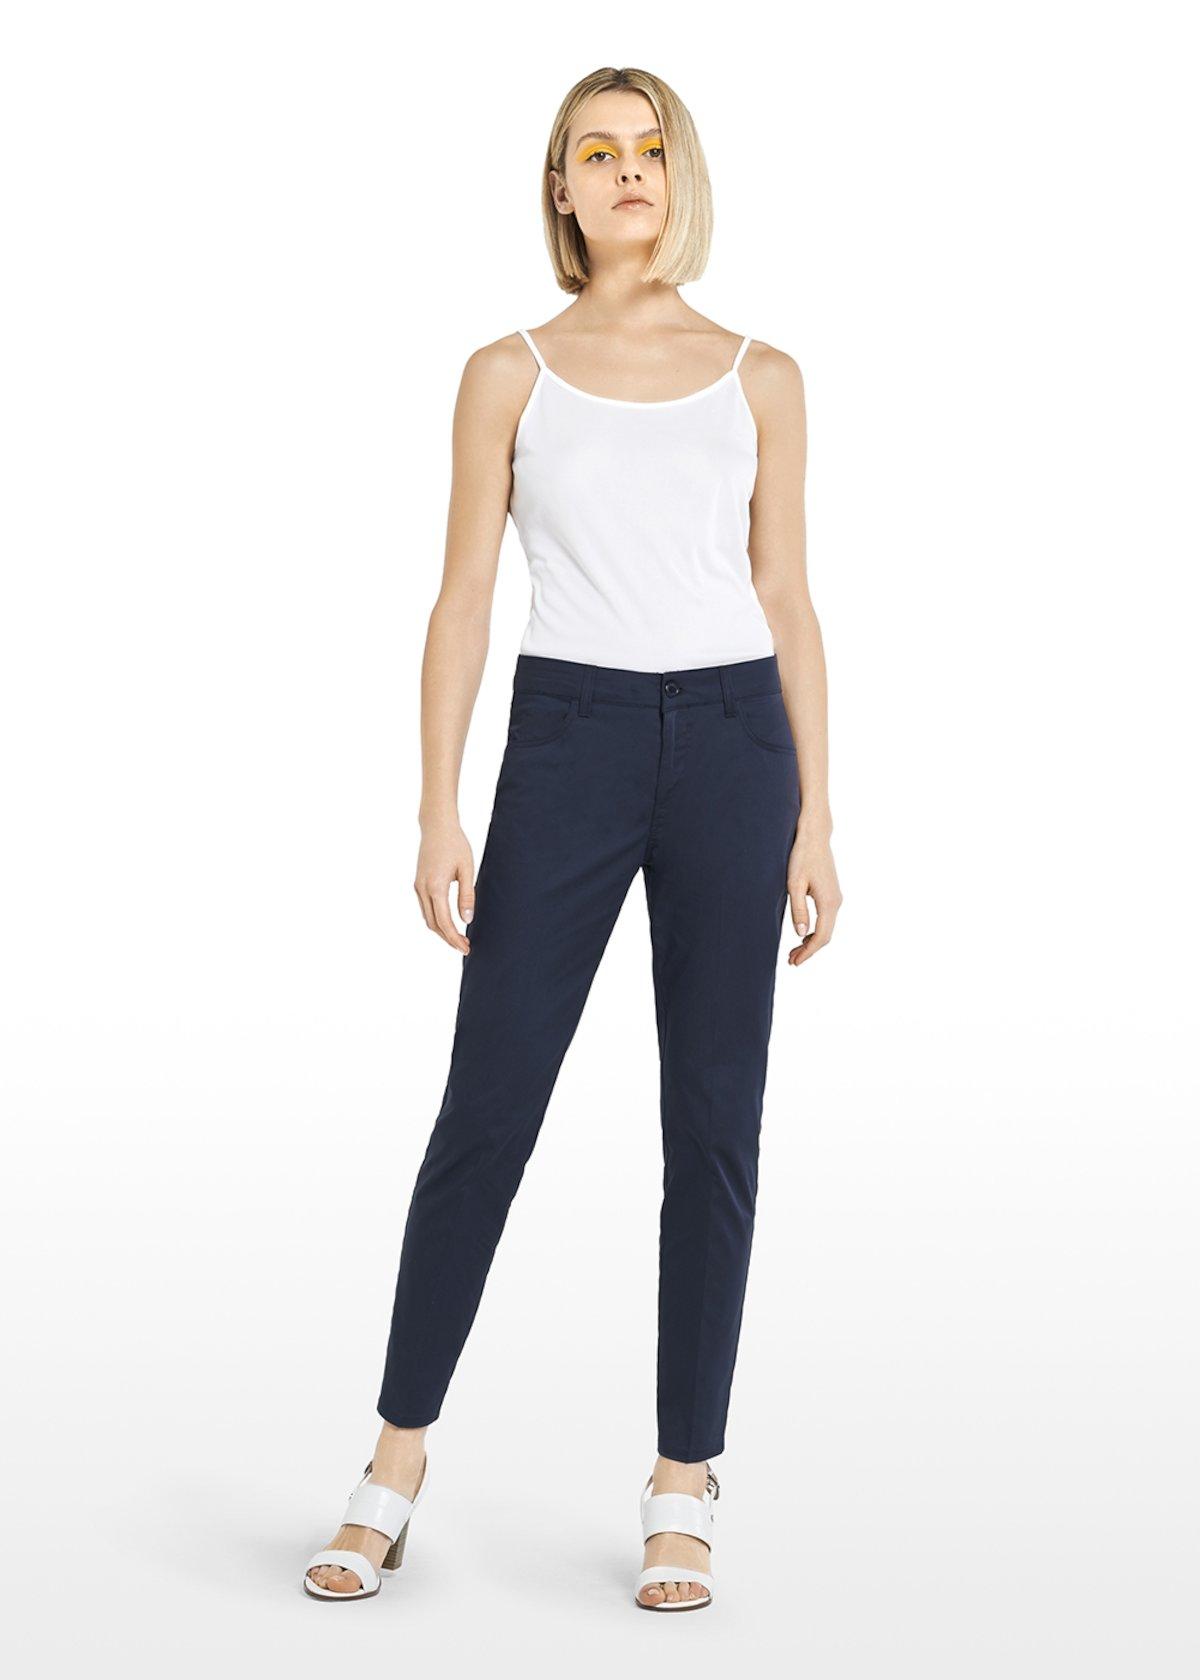 Kate C cotton trousers - Medium Blue - Woman - Category image